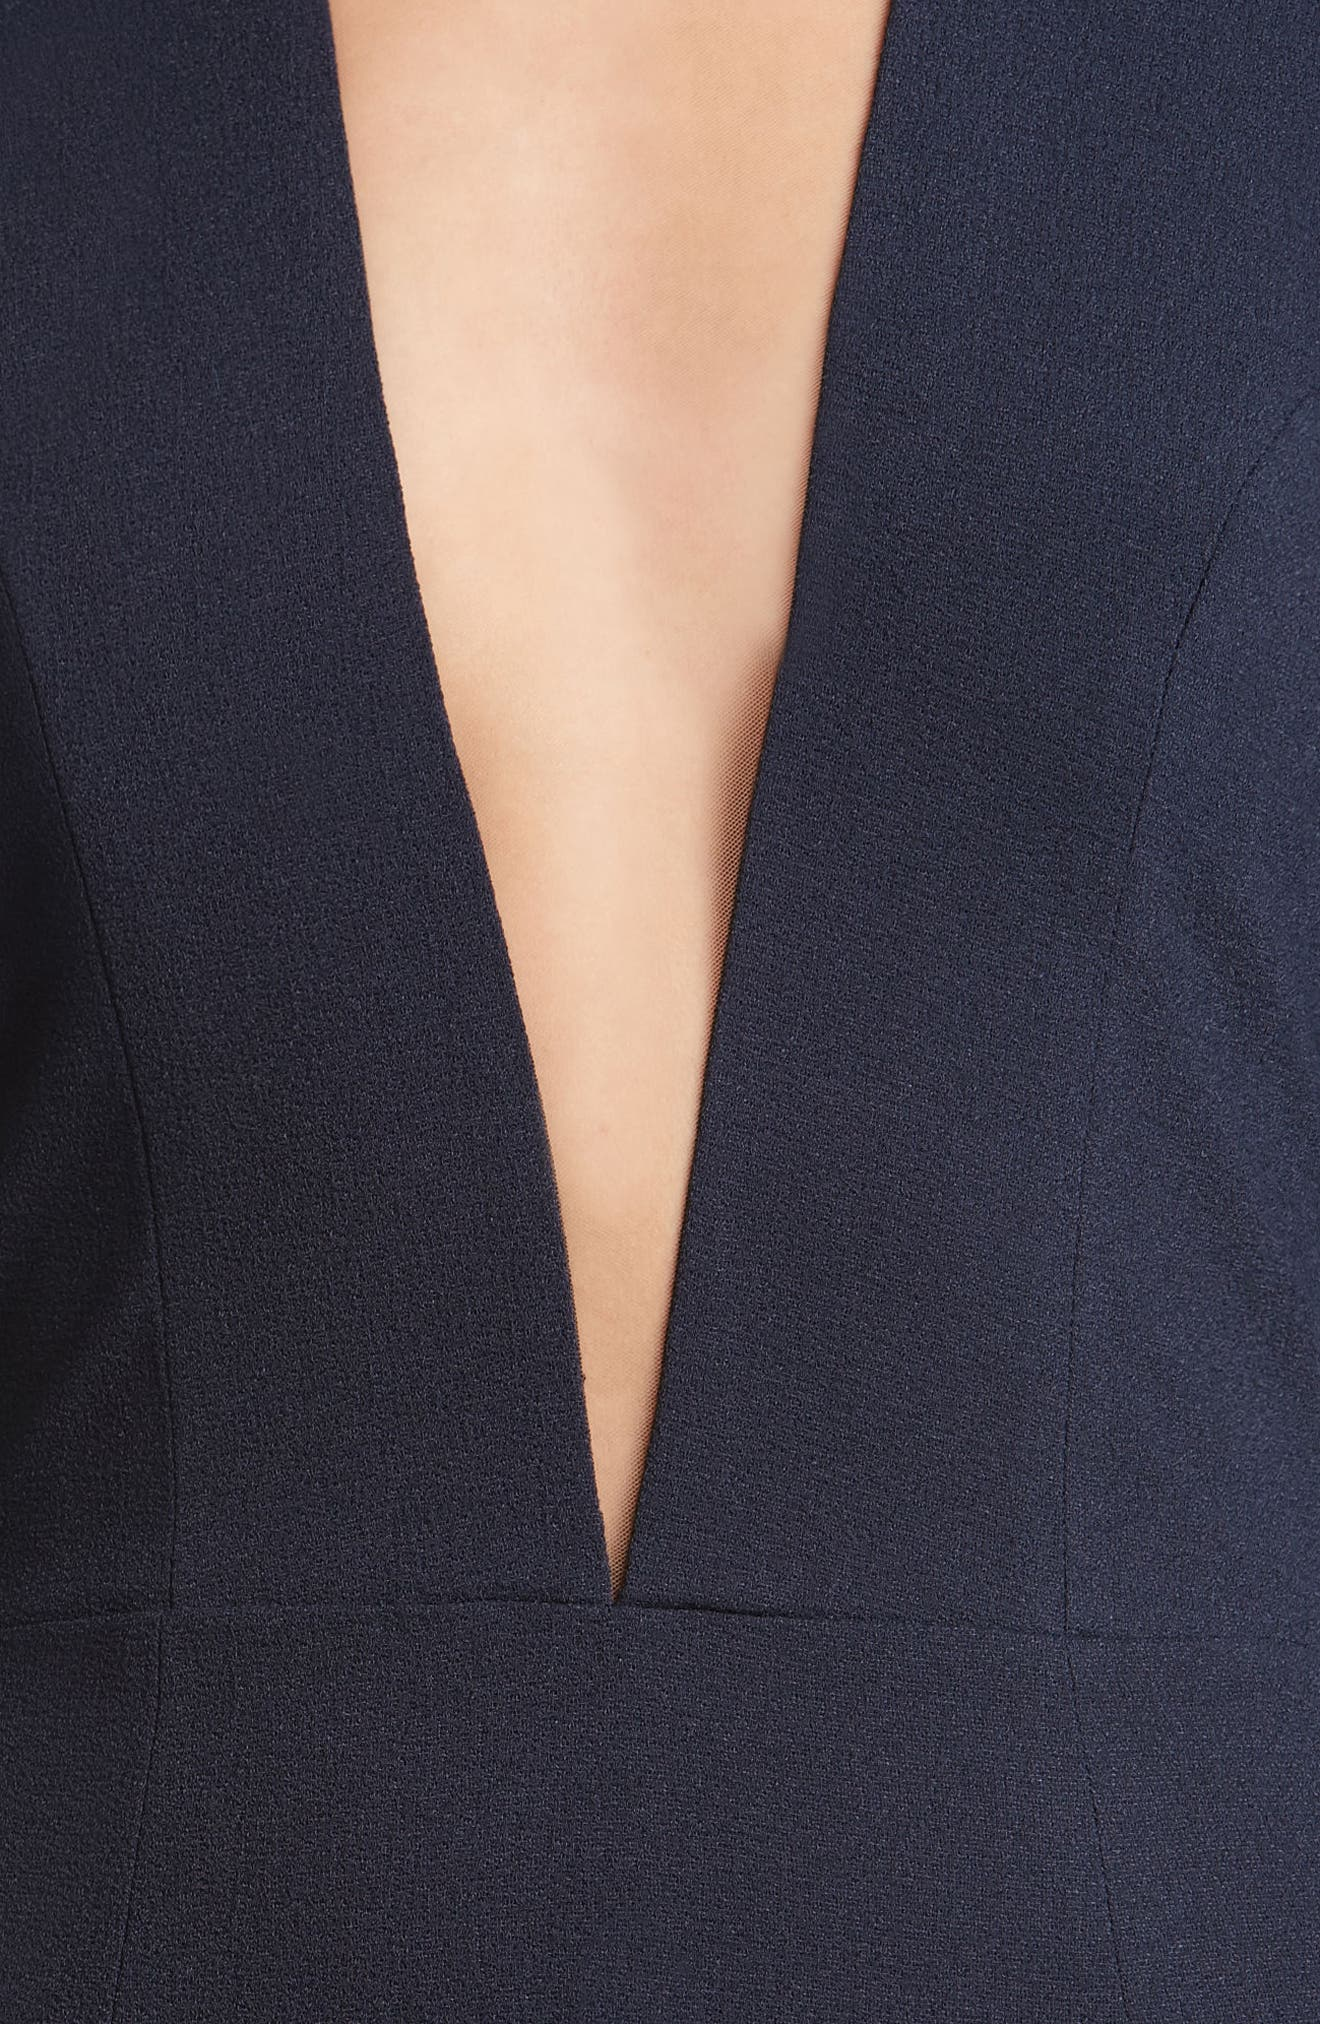 Kelli Plunging Crepe Sheath Dress,                             Alternate thumbnail 4, color,                             Navy